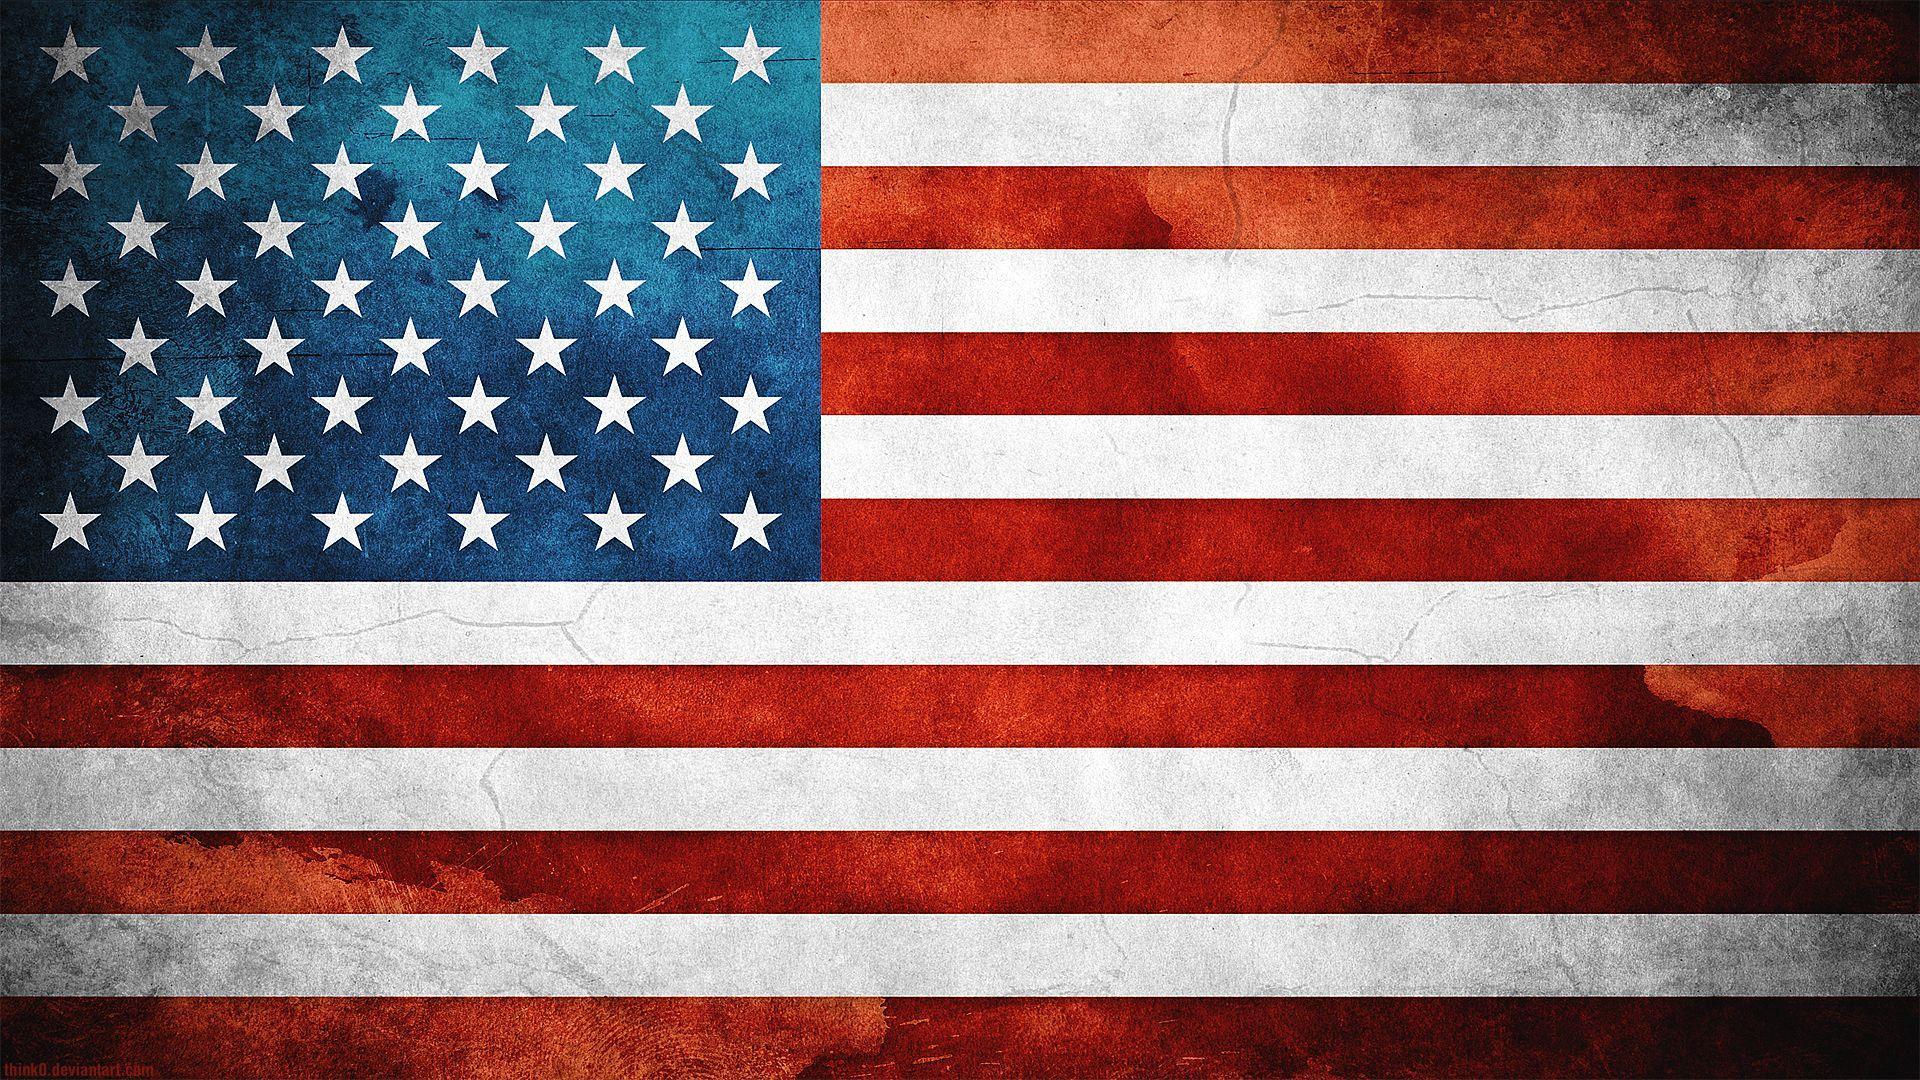 American Flag Wallpapers Top Free American Flag